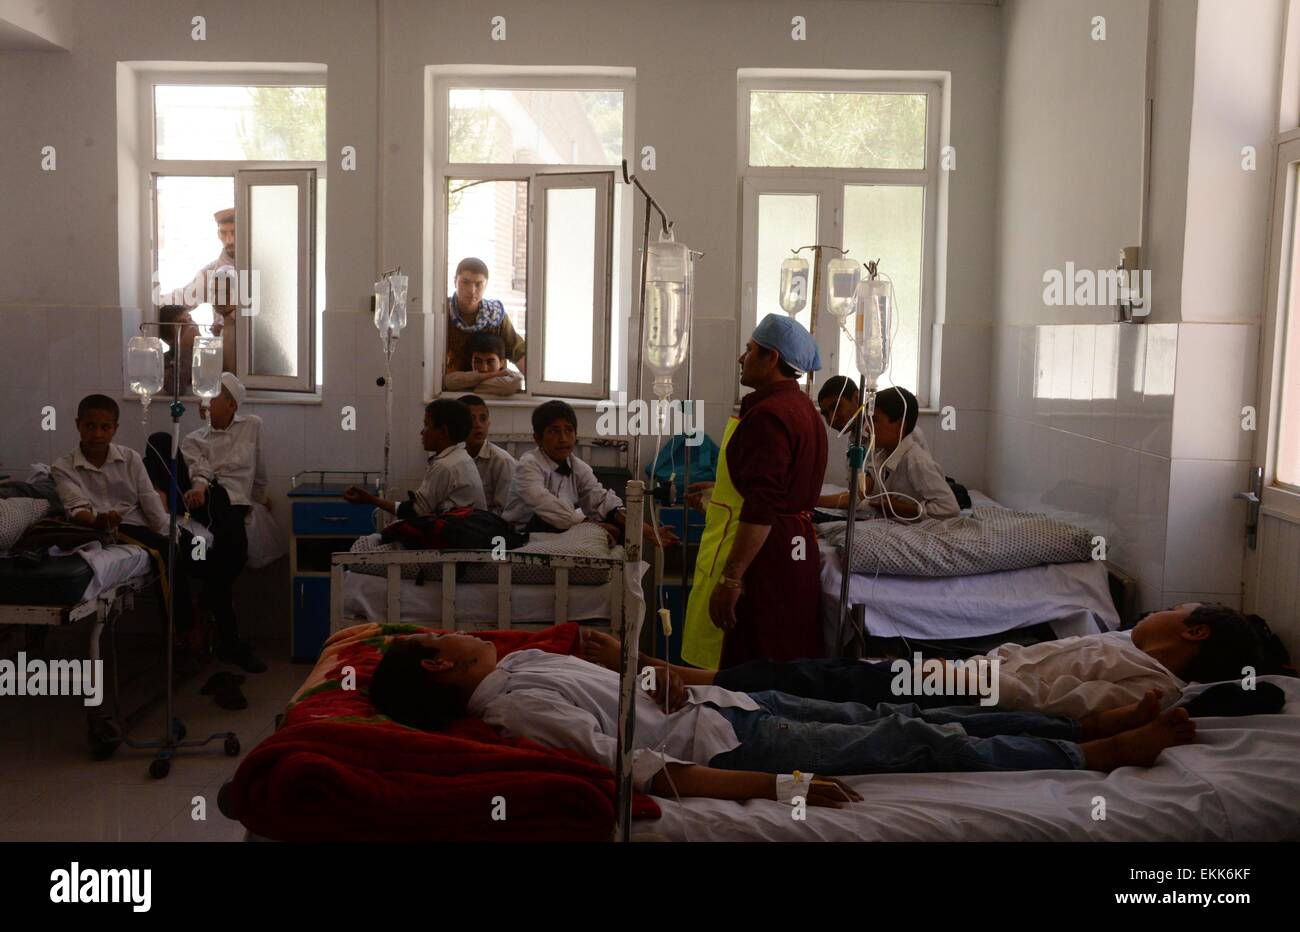 Herat, Afghanistan. 11. April 2015. Afghanische Schülerinnen und Schüler erhalten medizinische Behandlung Stockbild